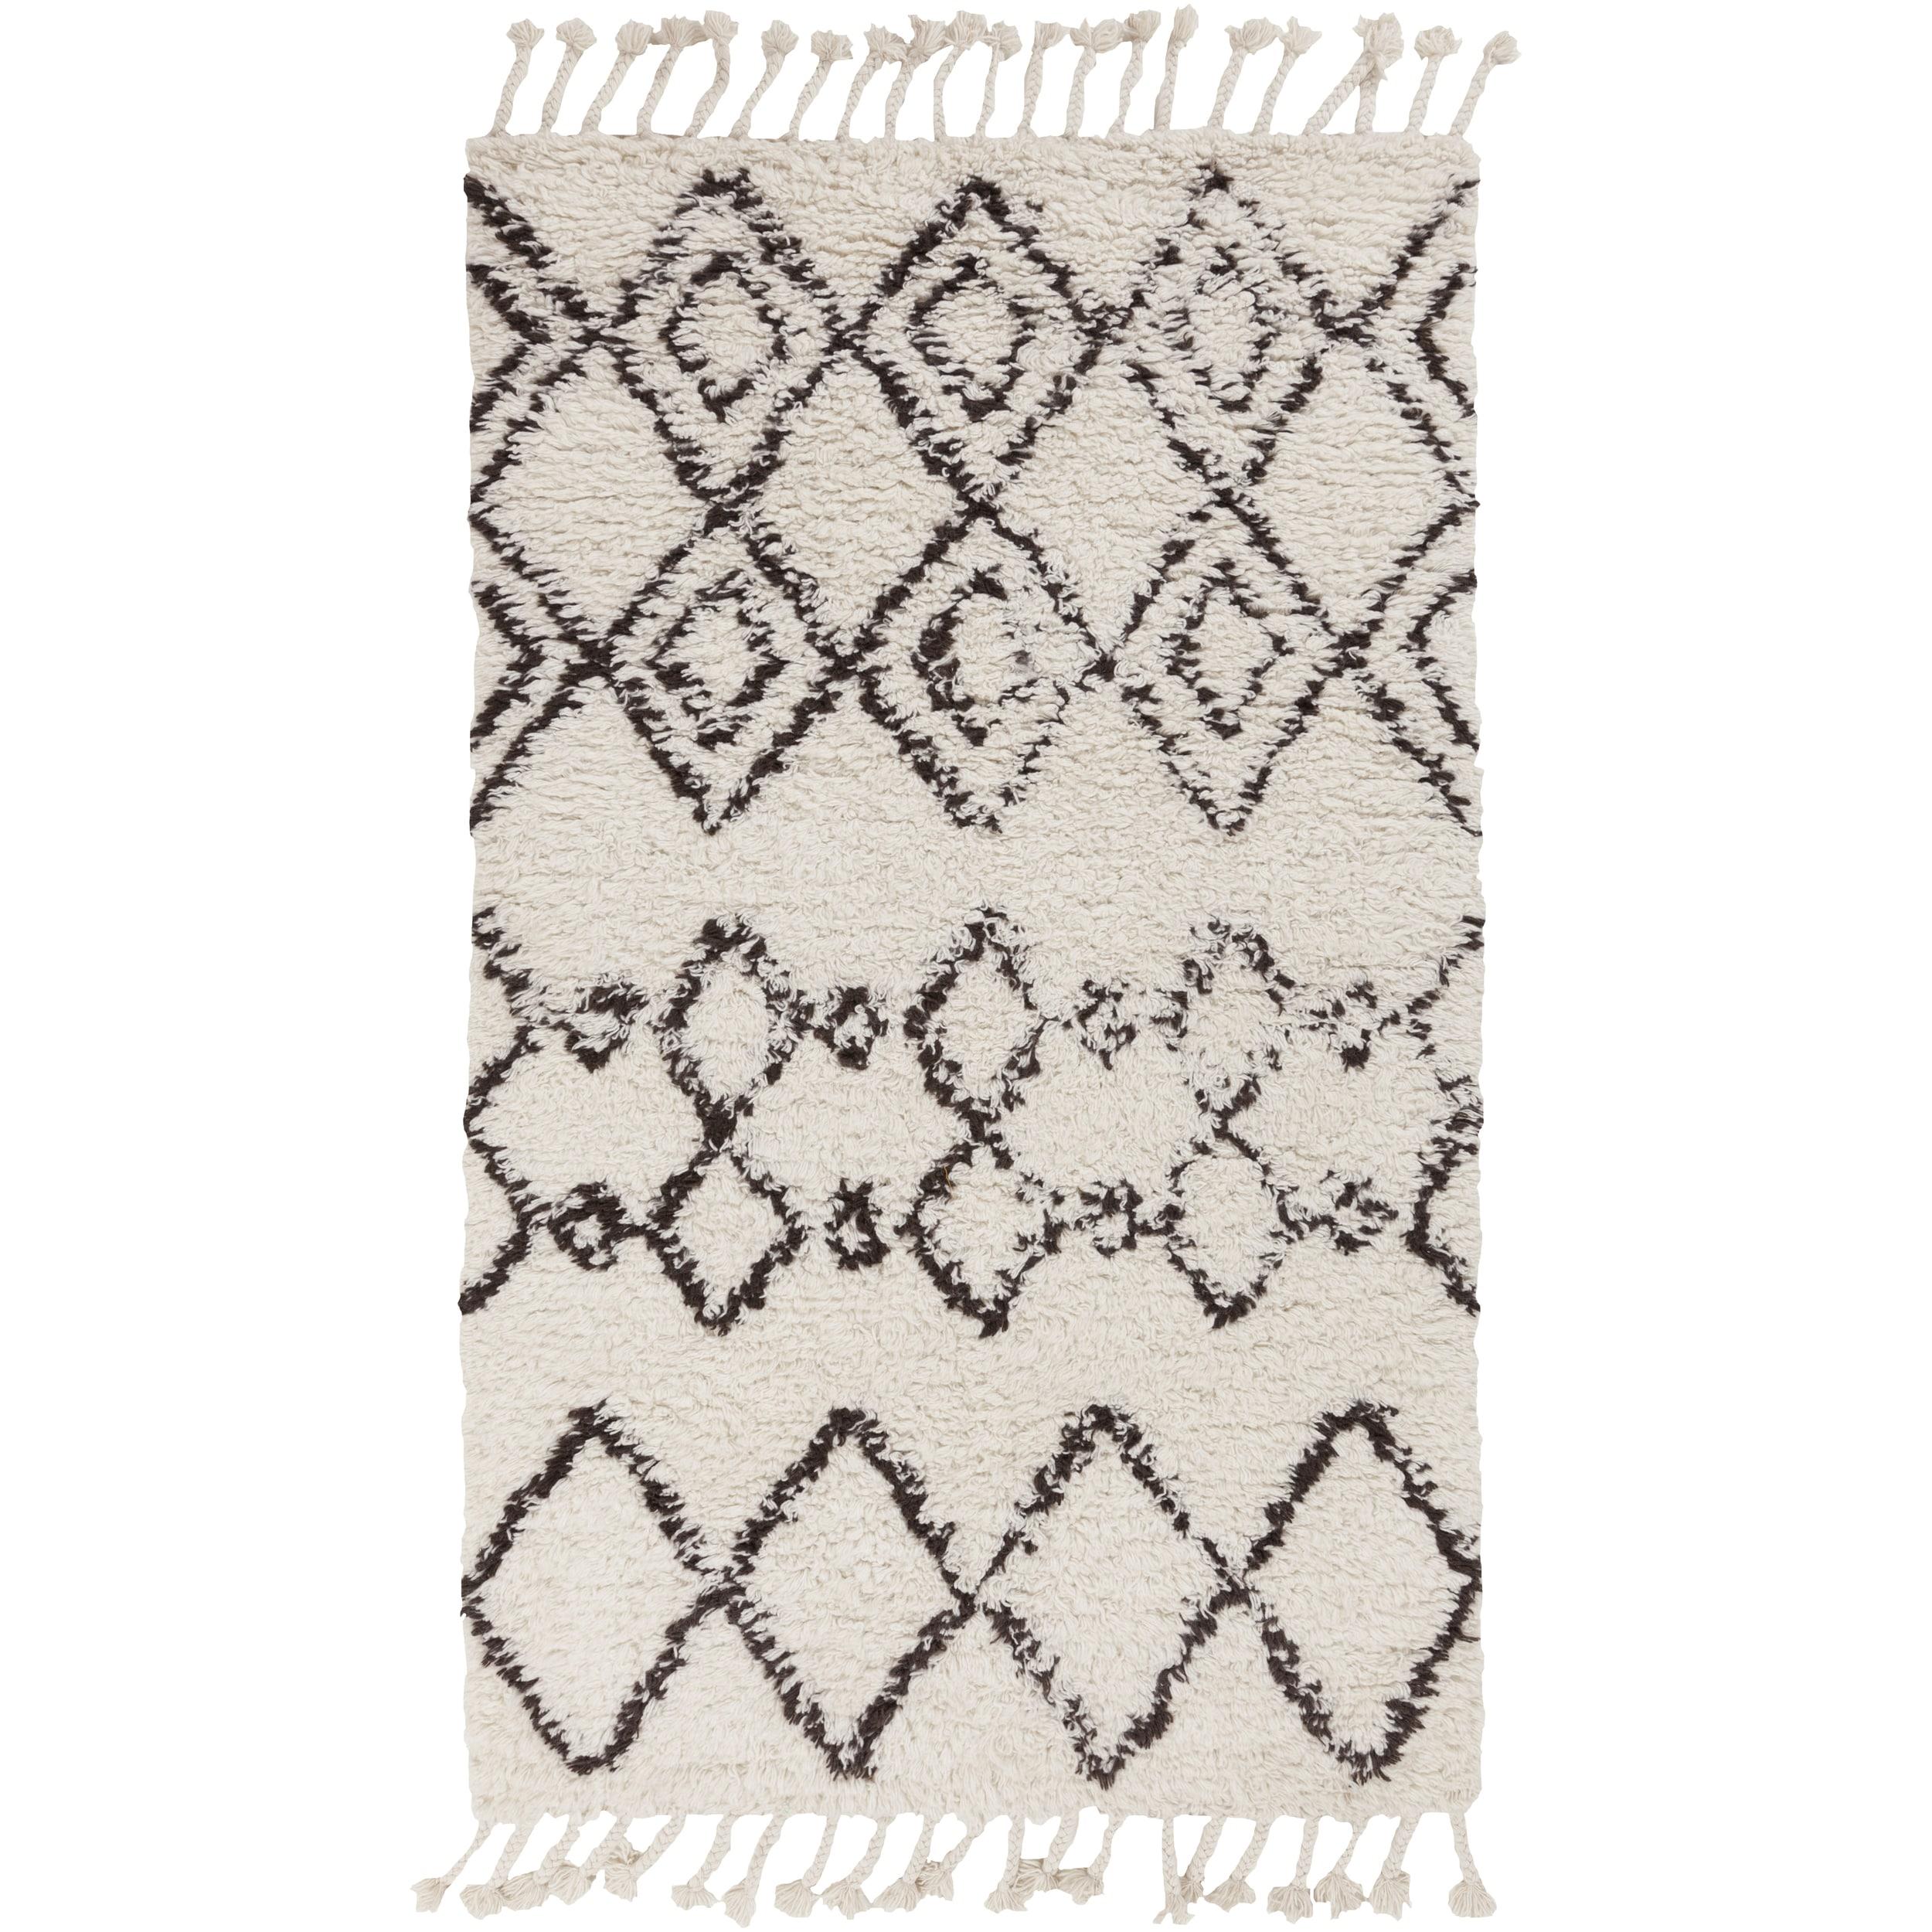 SURYA Hand-Woven Erika Geometric Wool Rug (9' x 13') (Tan...